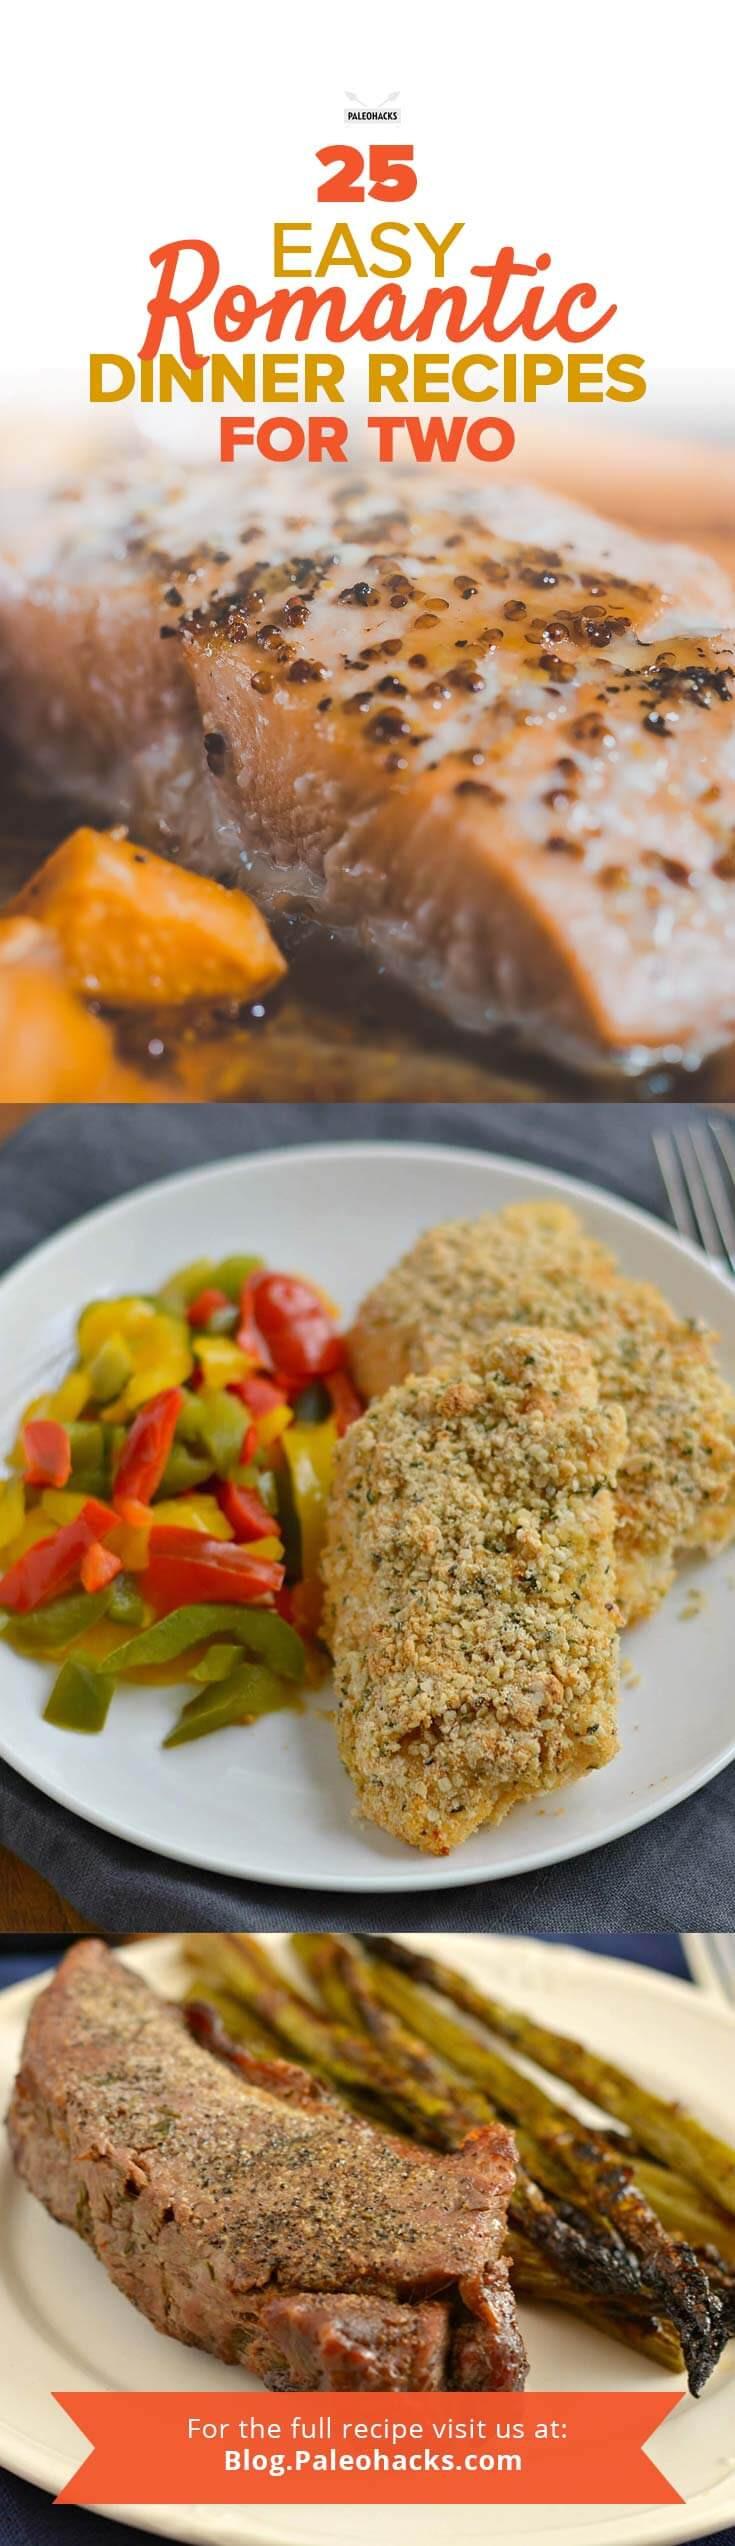 Easy Dinner For Two  25 Easy Romantic Dinner Recipes for Two